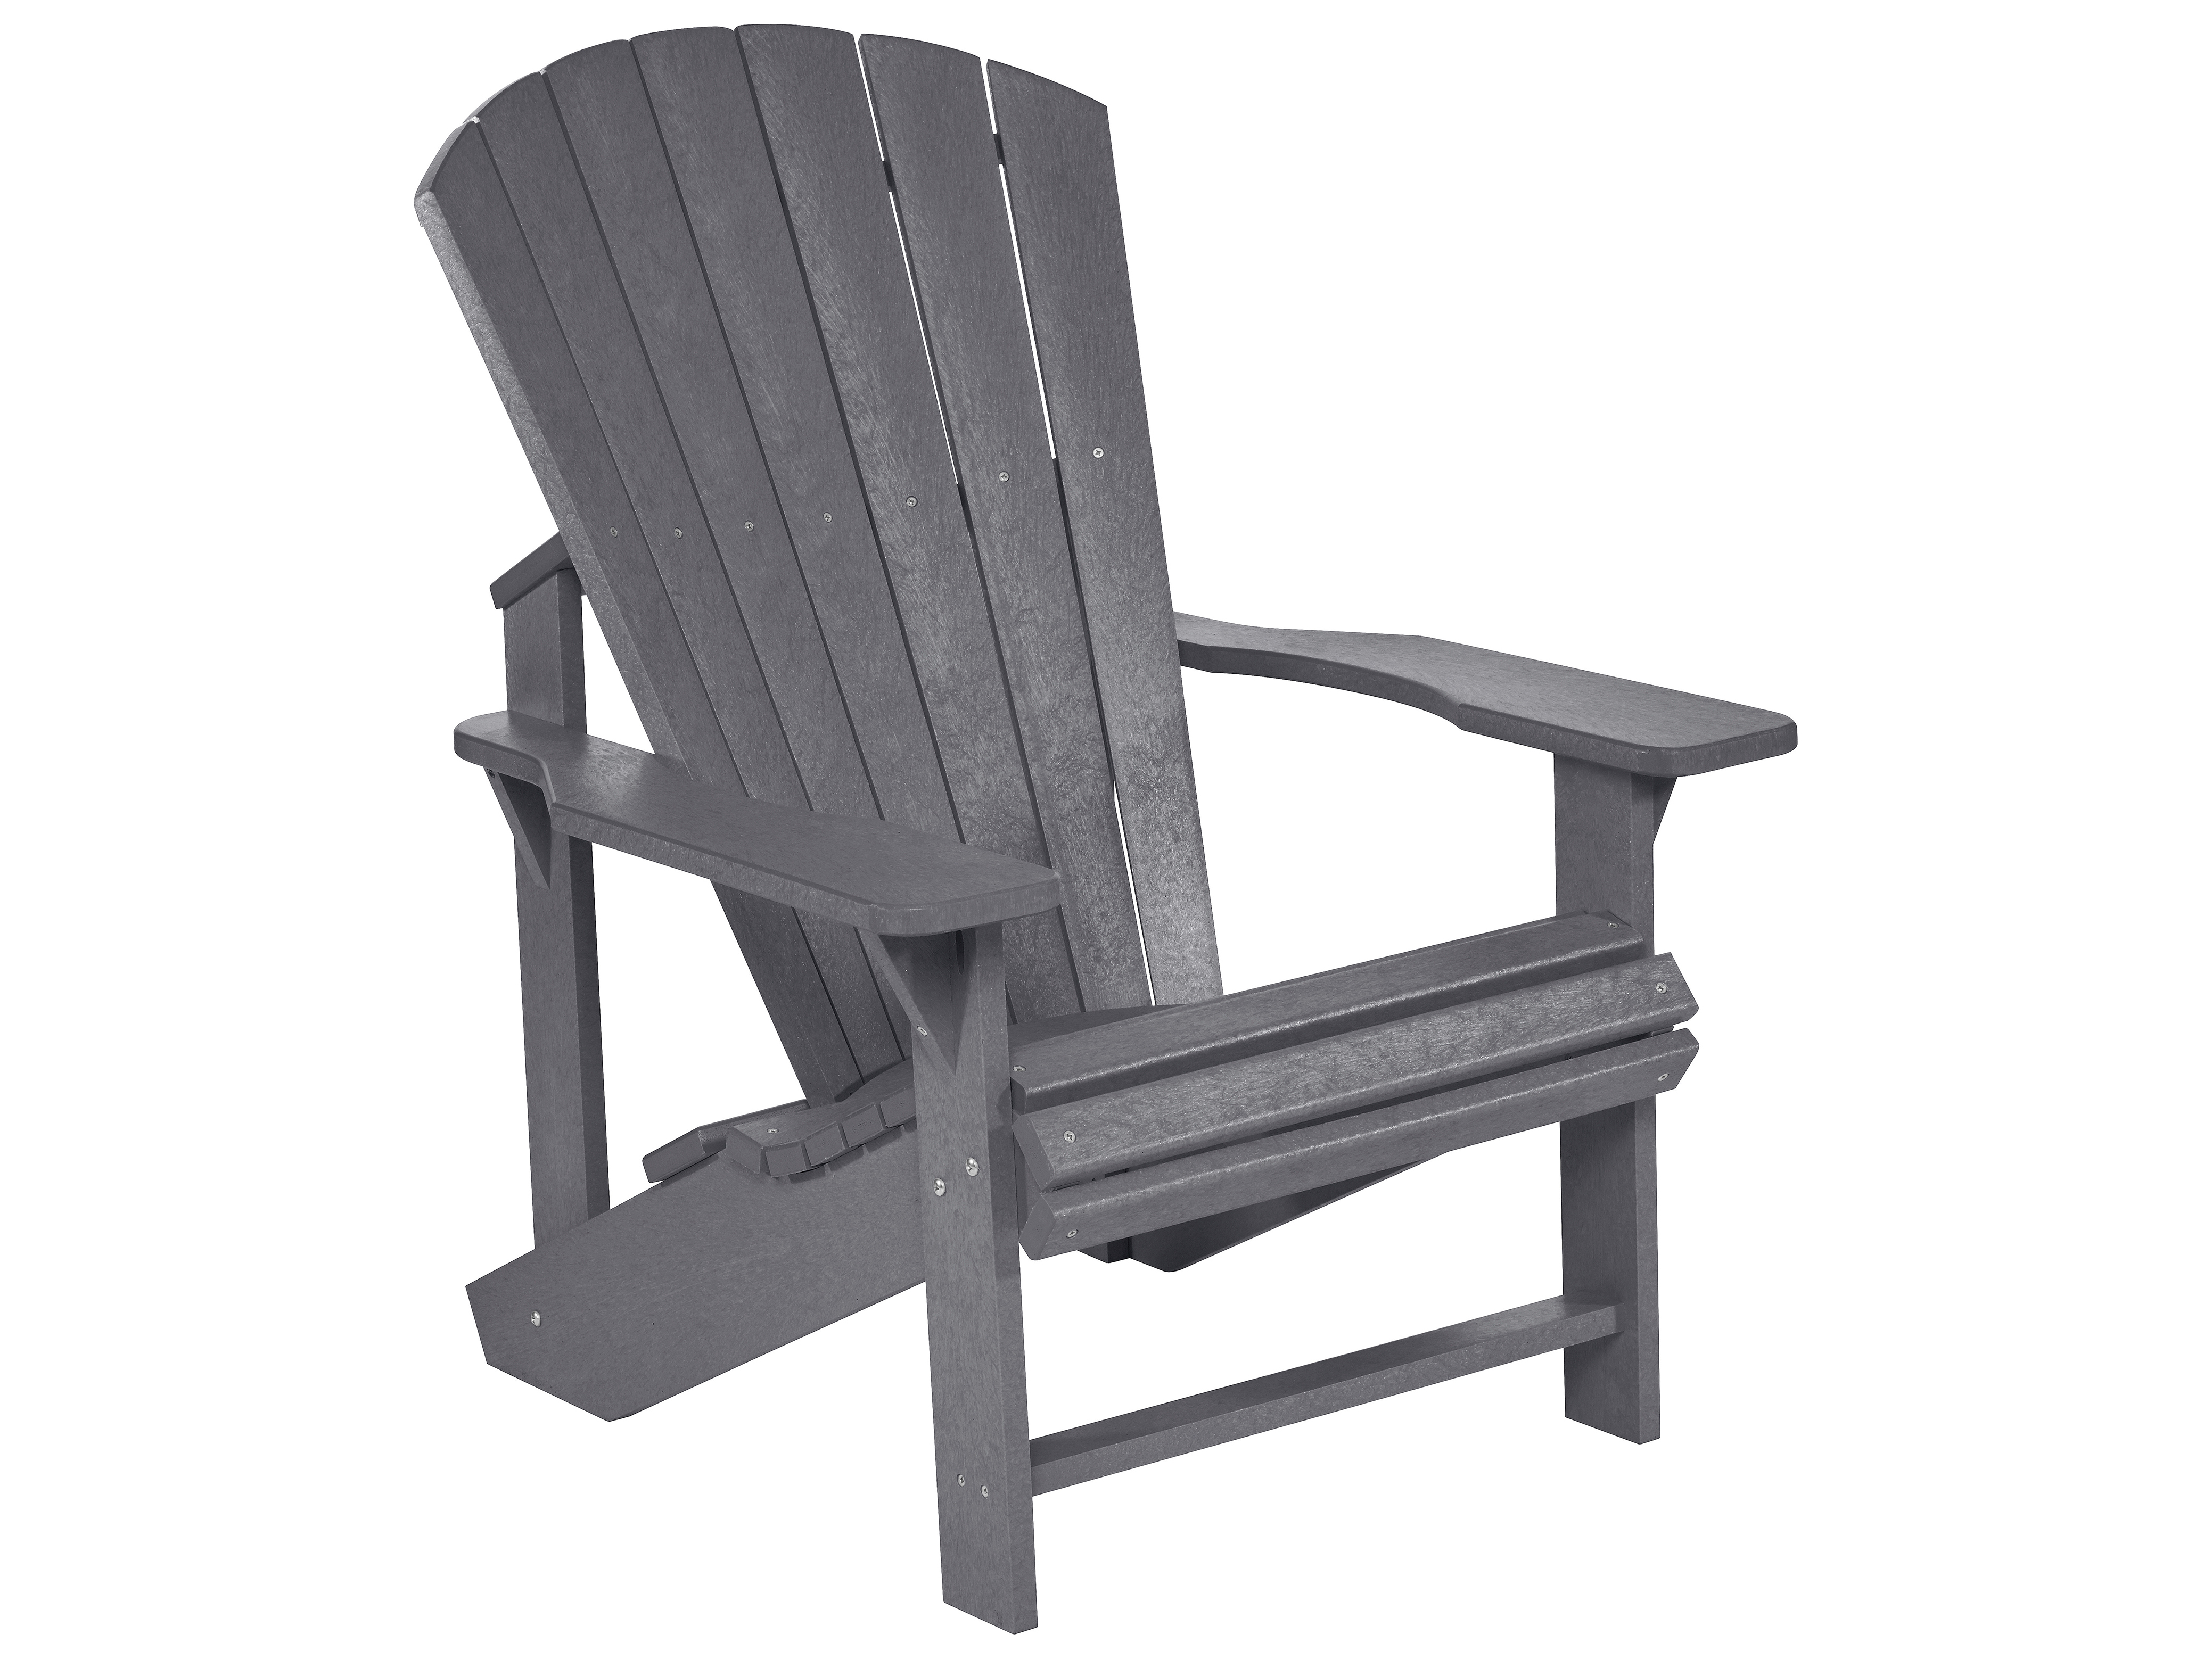 C R Plastic Generation Arm Lounge Chair